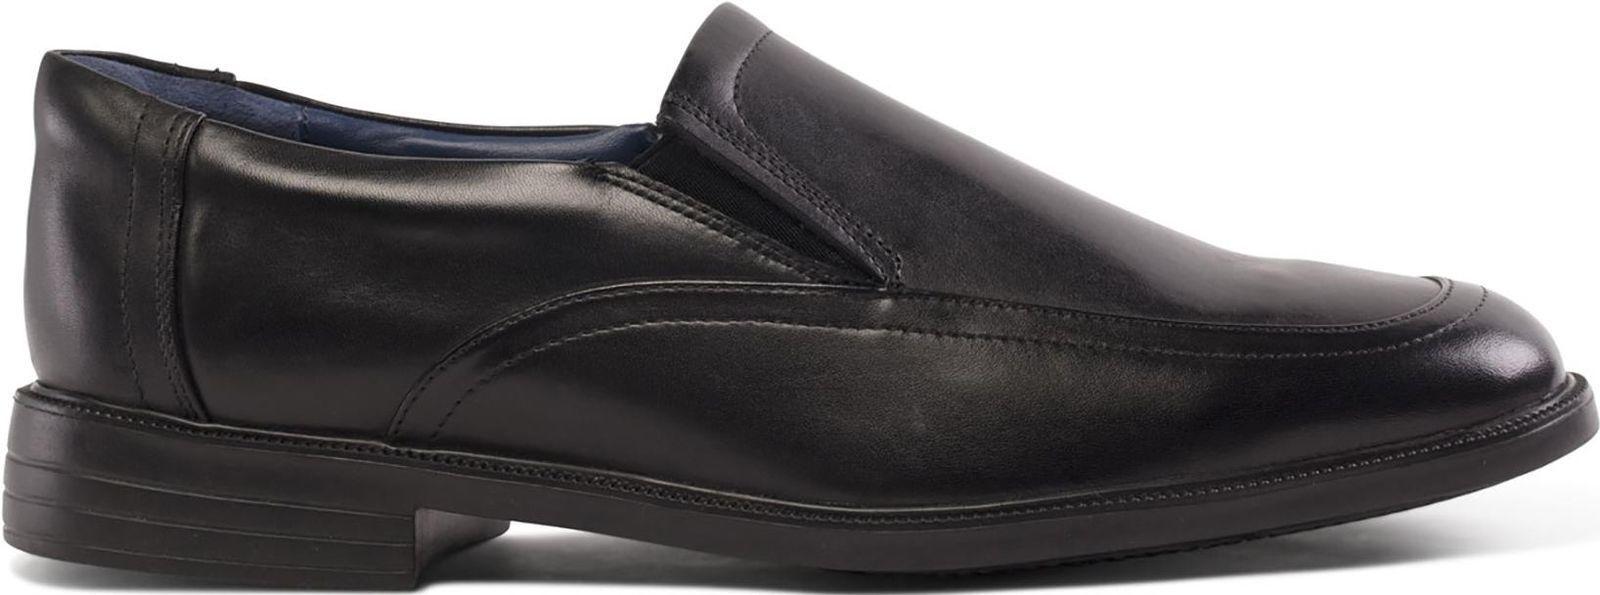 Mens Black Slip On Leather Padders Shoes Formal Feel Good Feet Shoes Padders Bond 46dc14